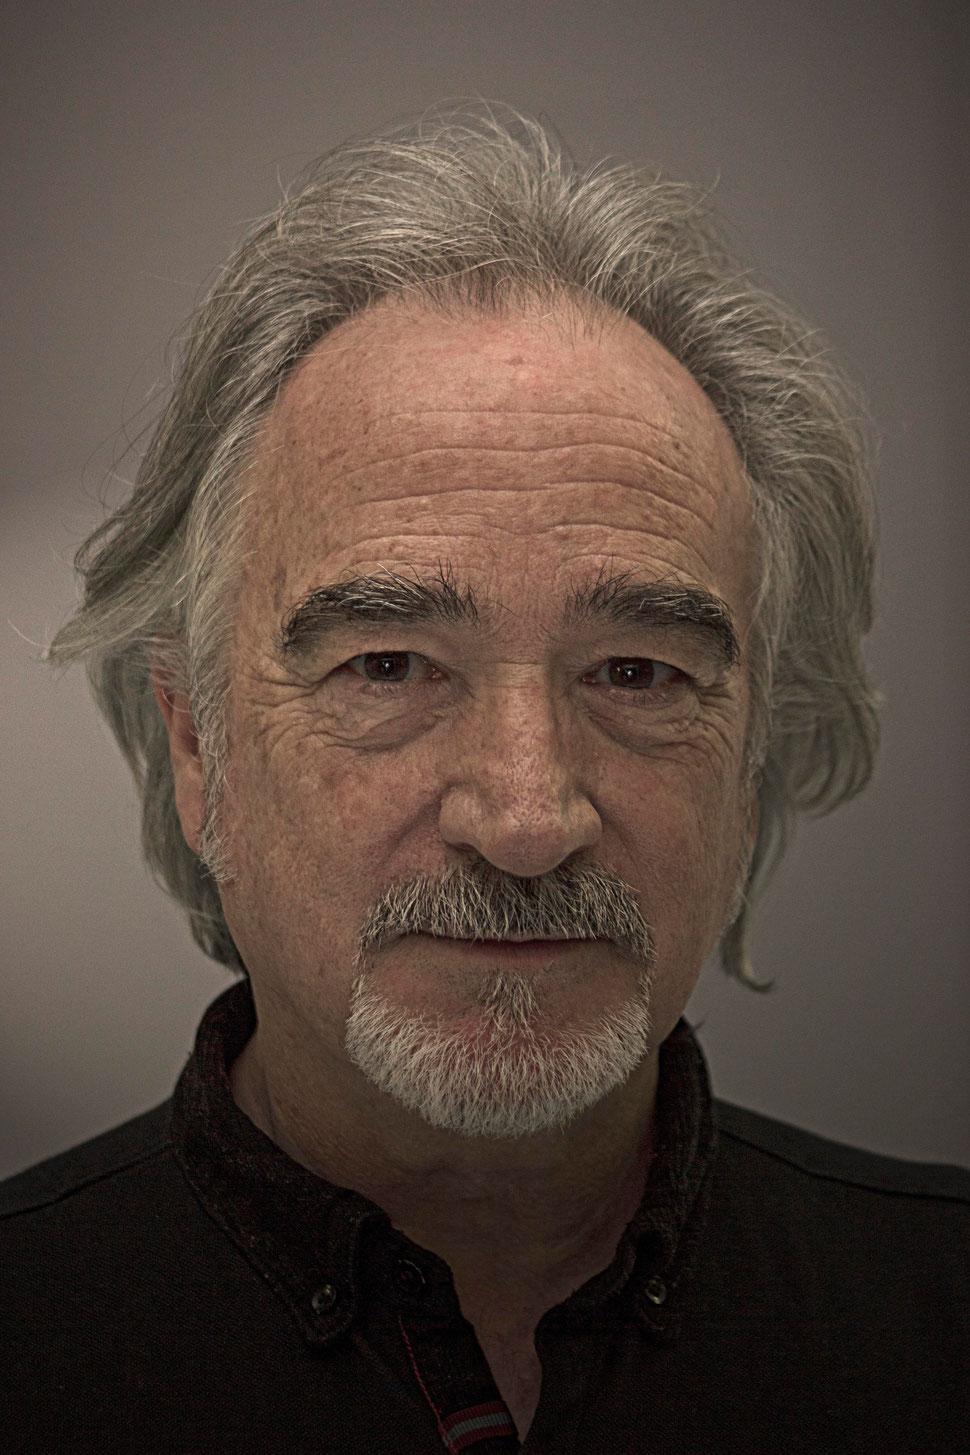 Ricardo Jóven